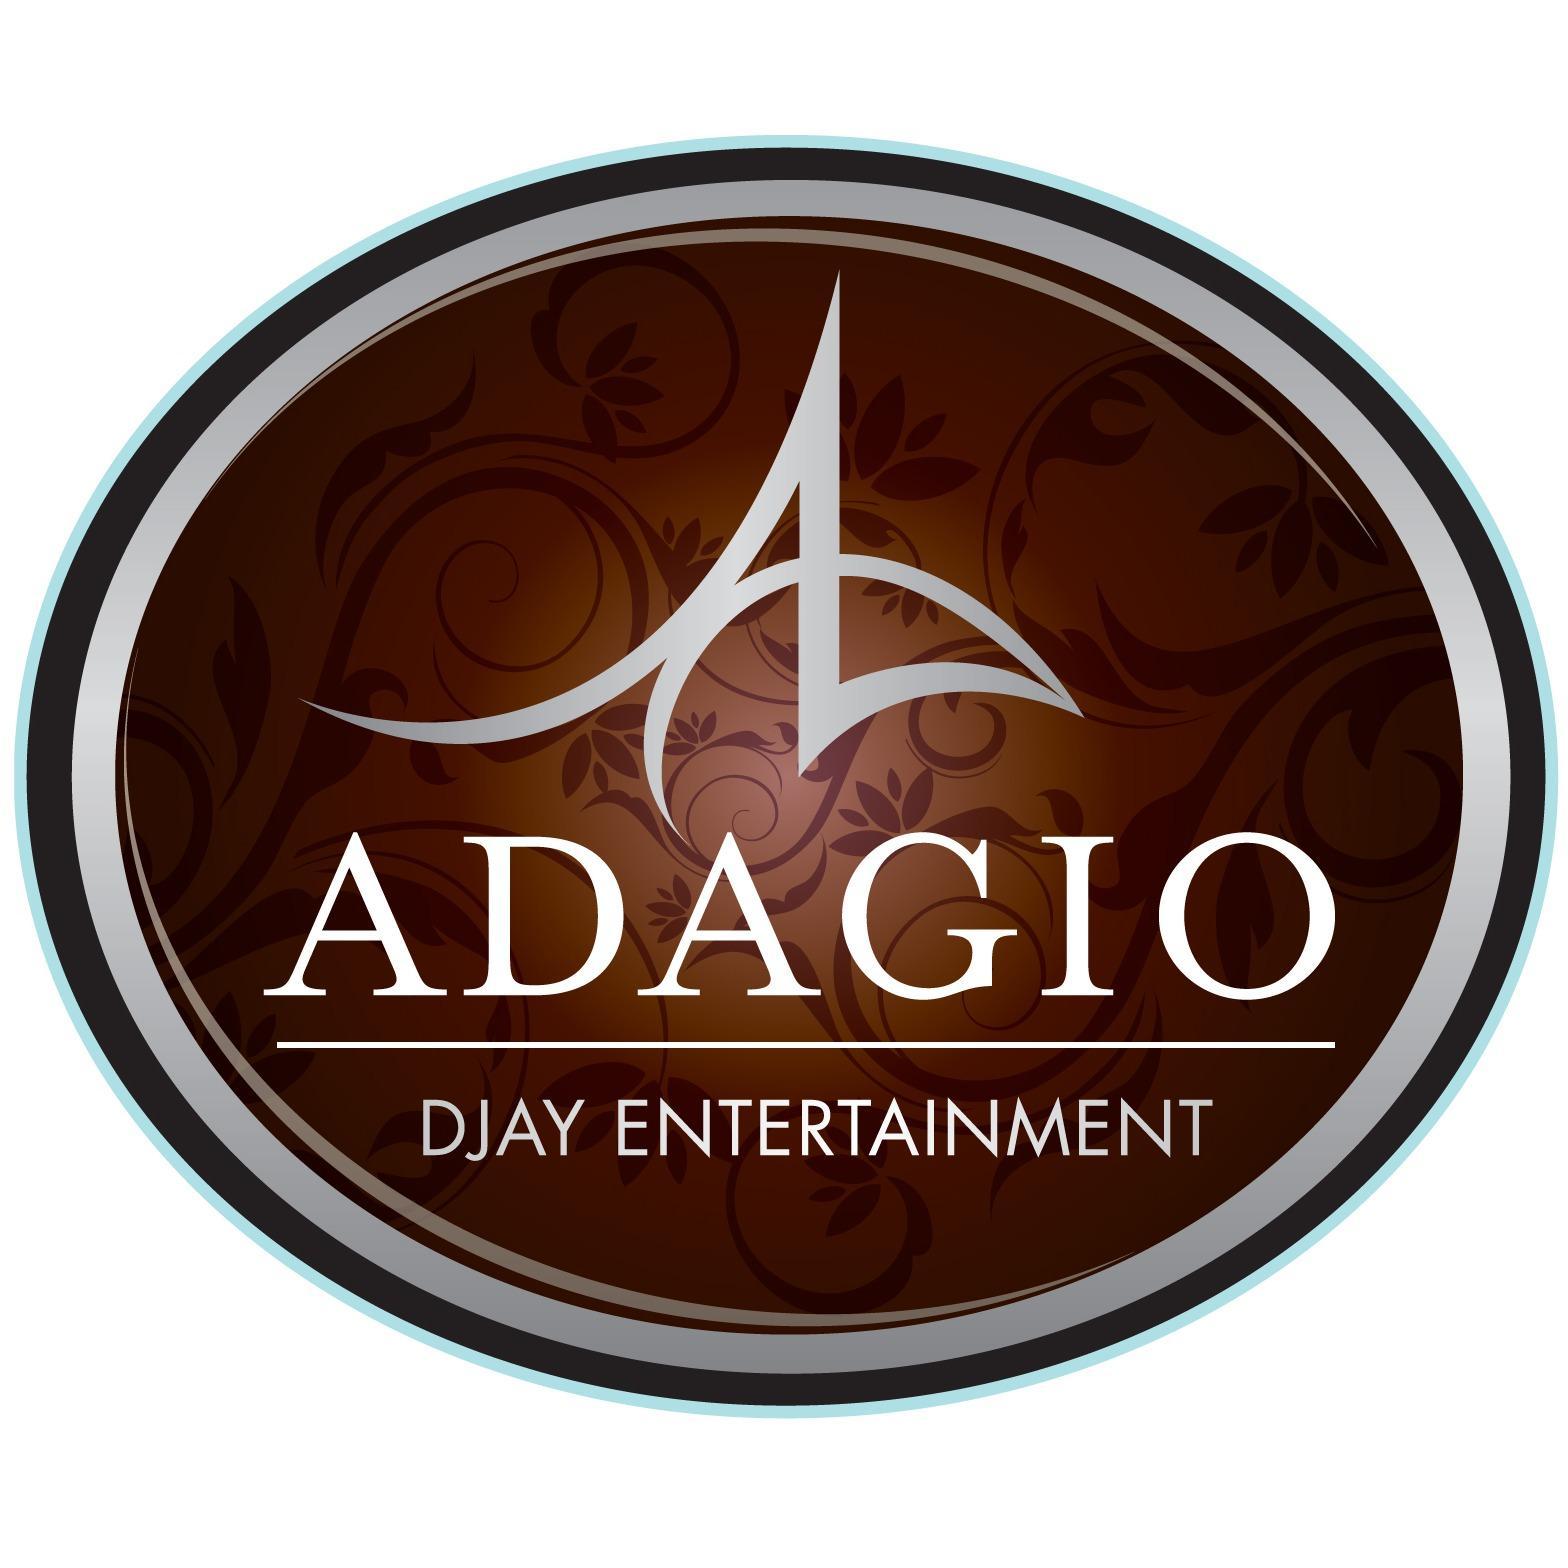 Adagio Djay Entertainment